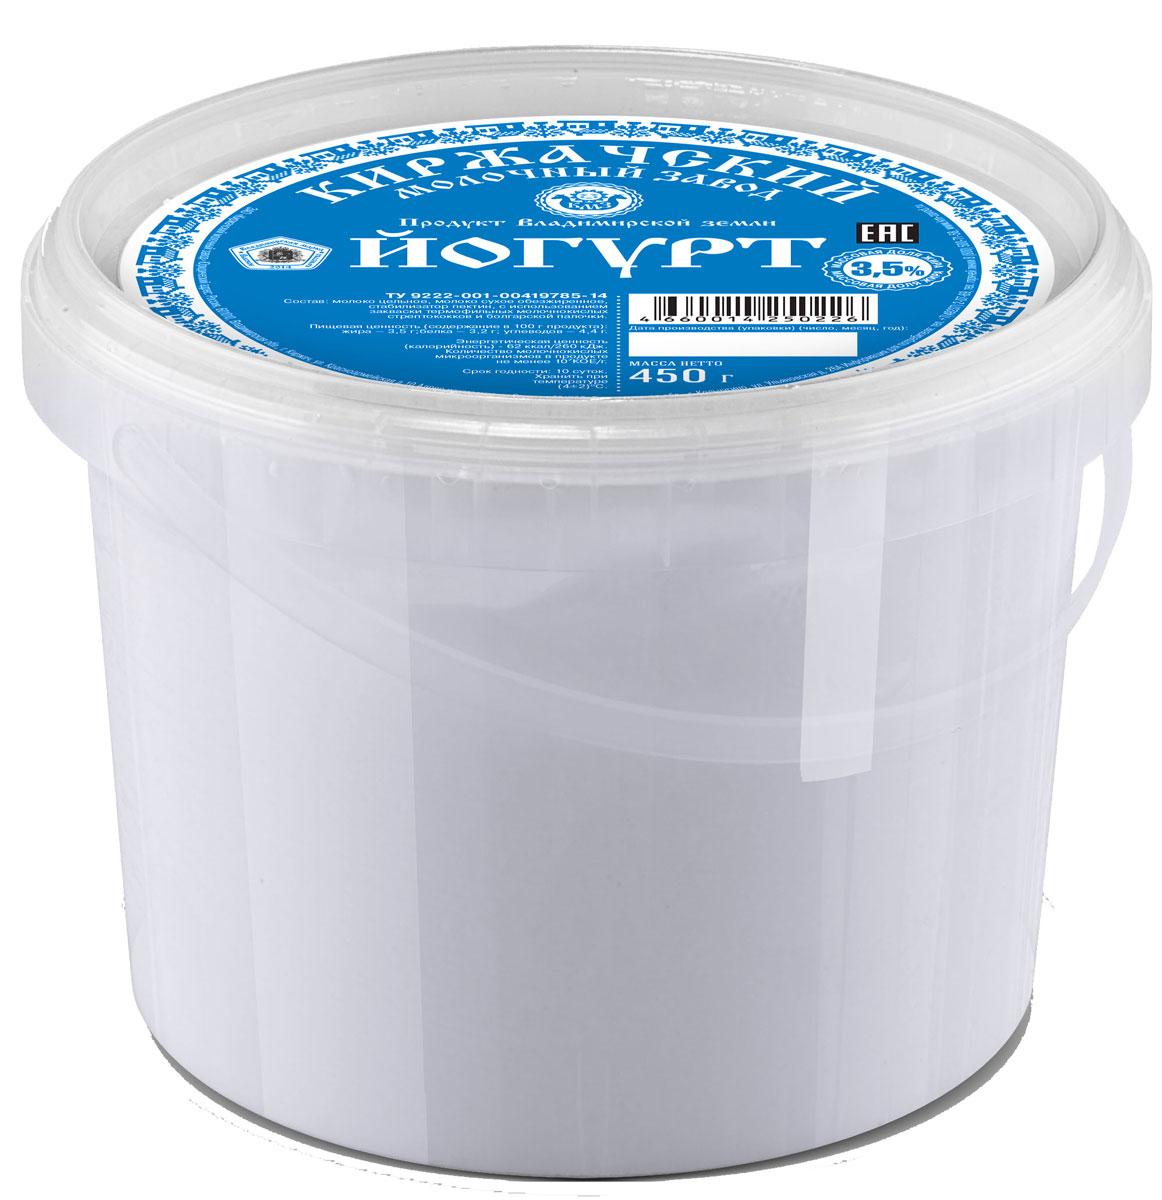 Киржачский МЗ Йогурт натуральный, 3,5% , 450 г, Киржачский молочный завод